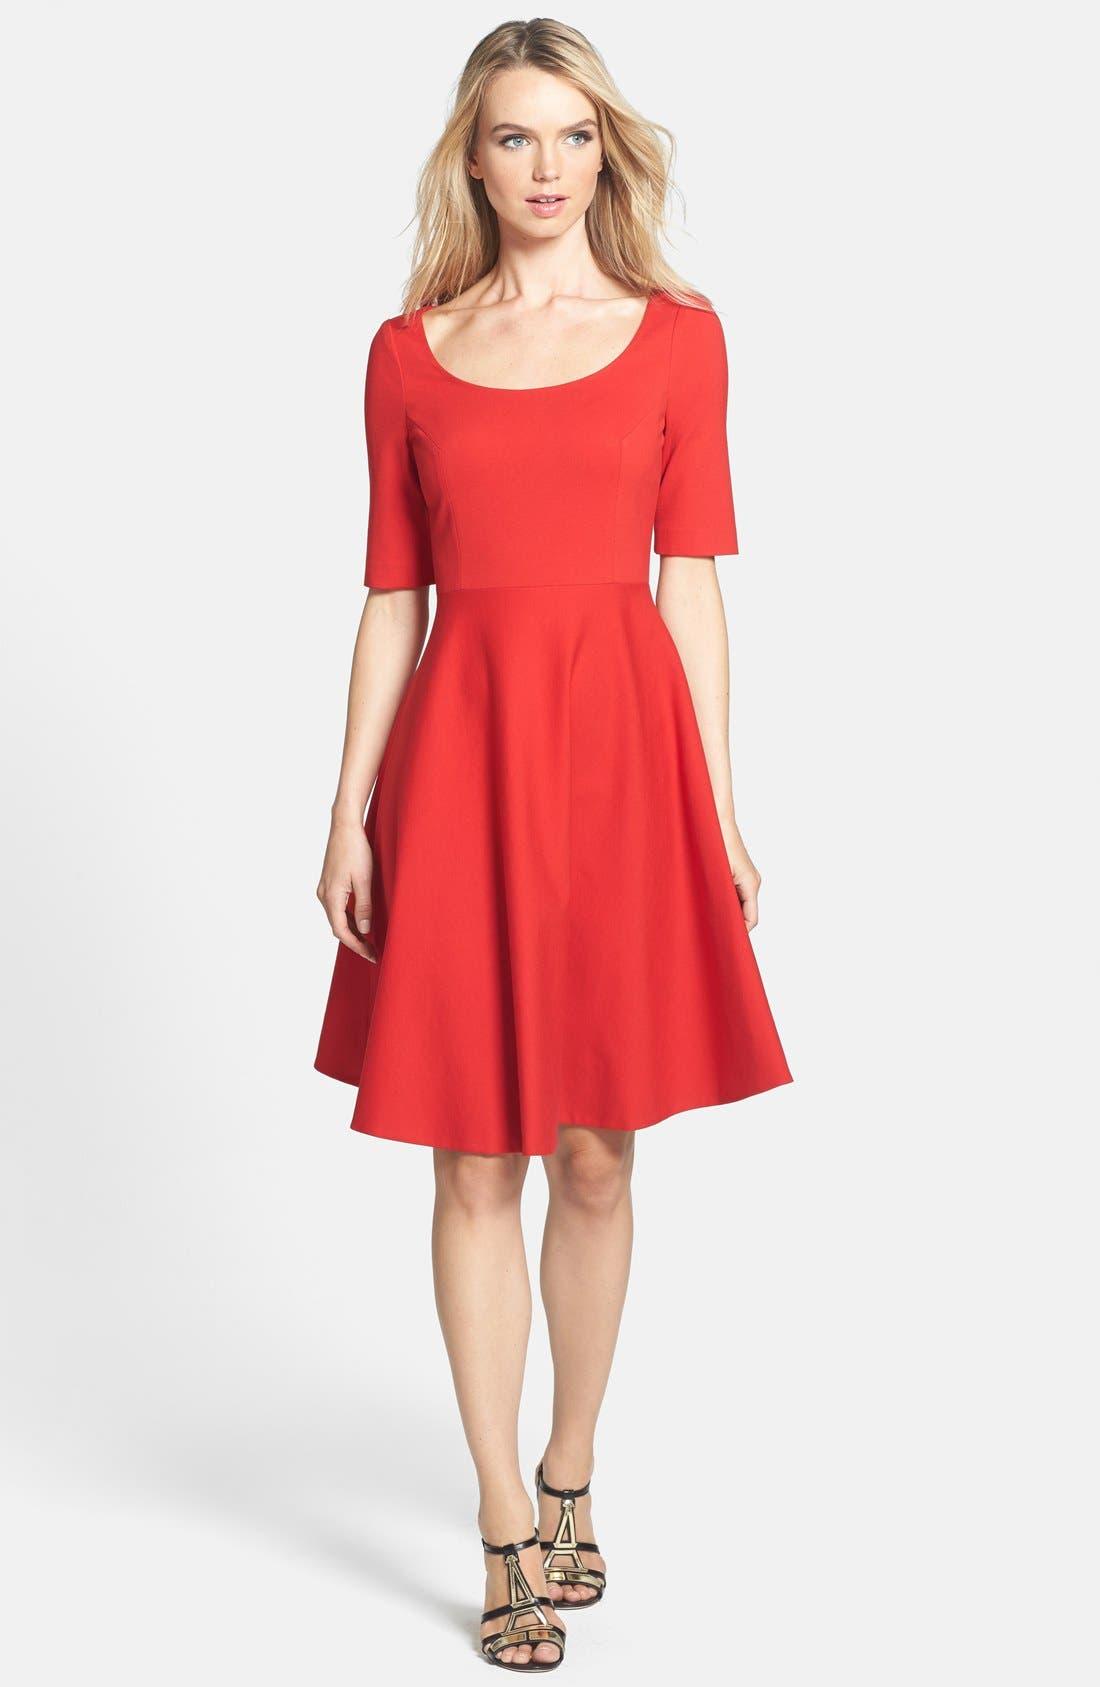 Alternate Image 1 Selected - kate spade new york 'jada' stretch fit & flare dress